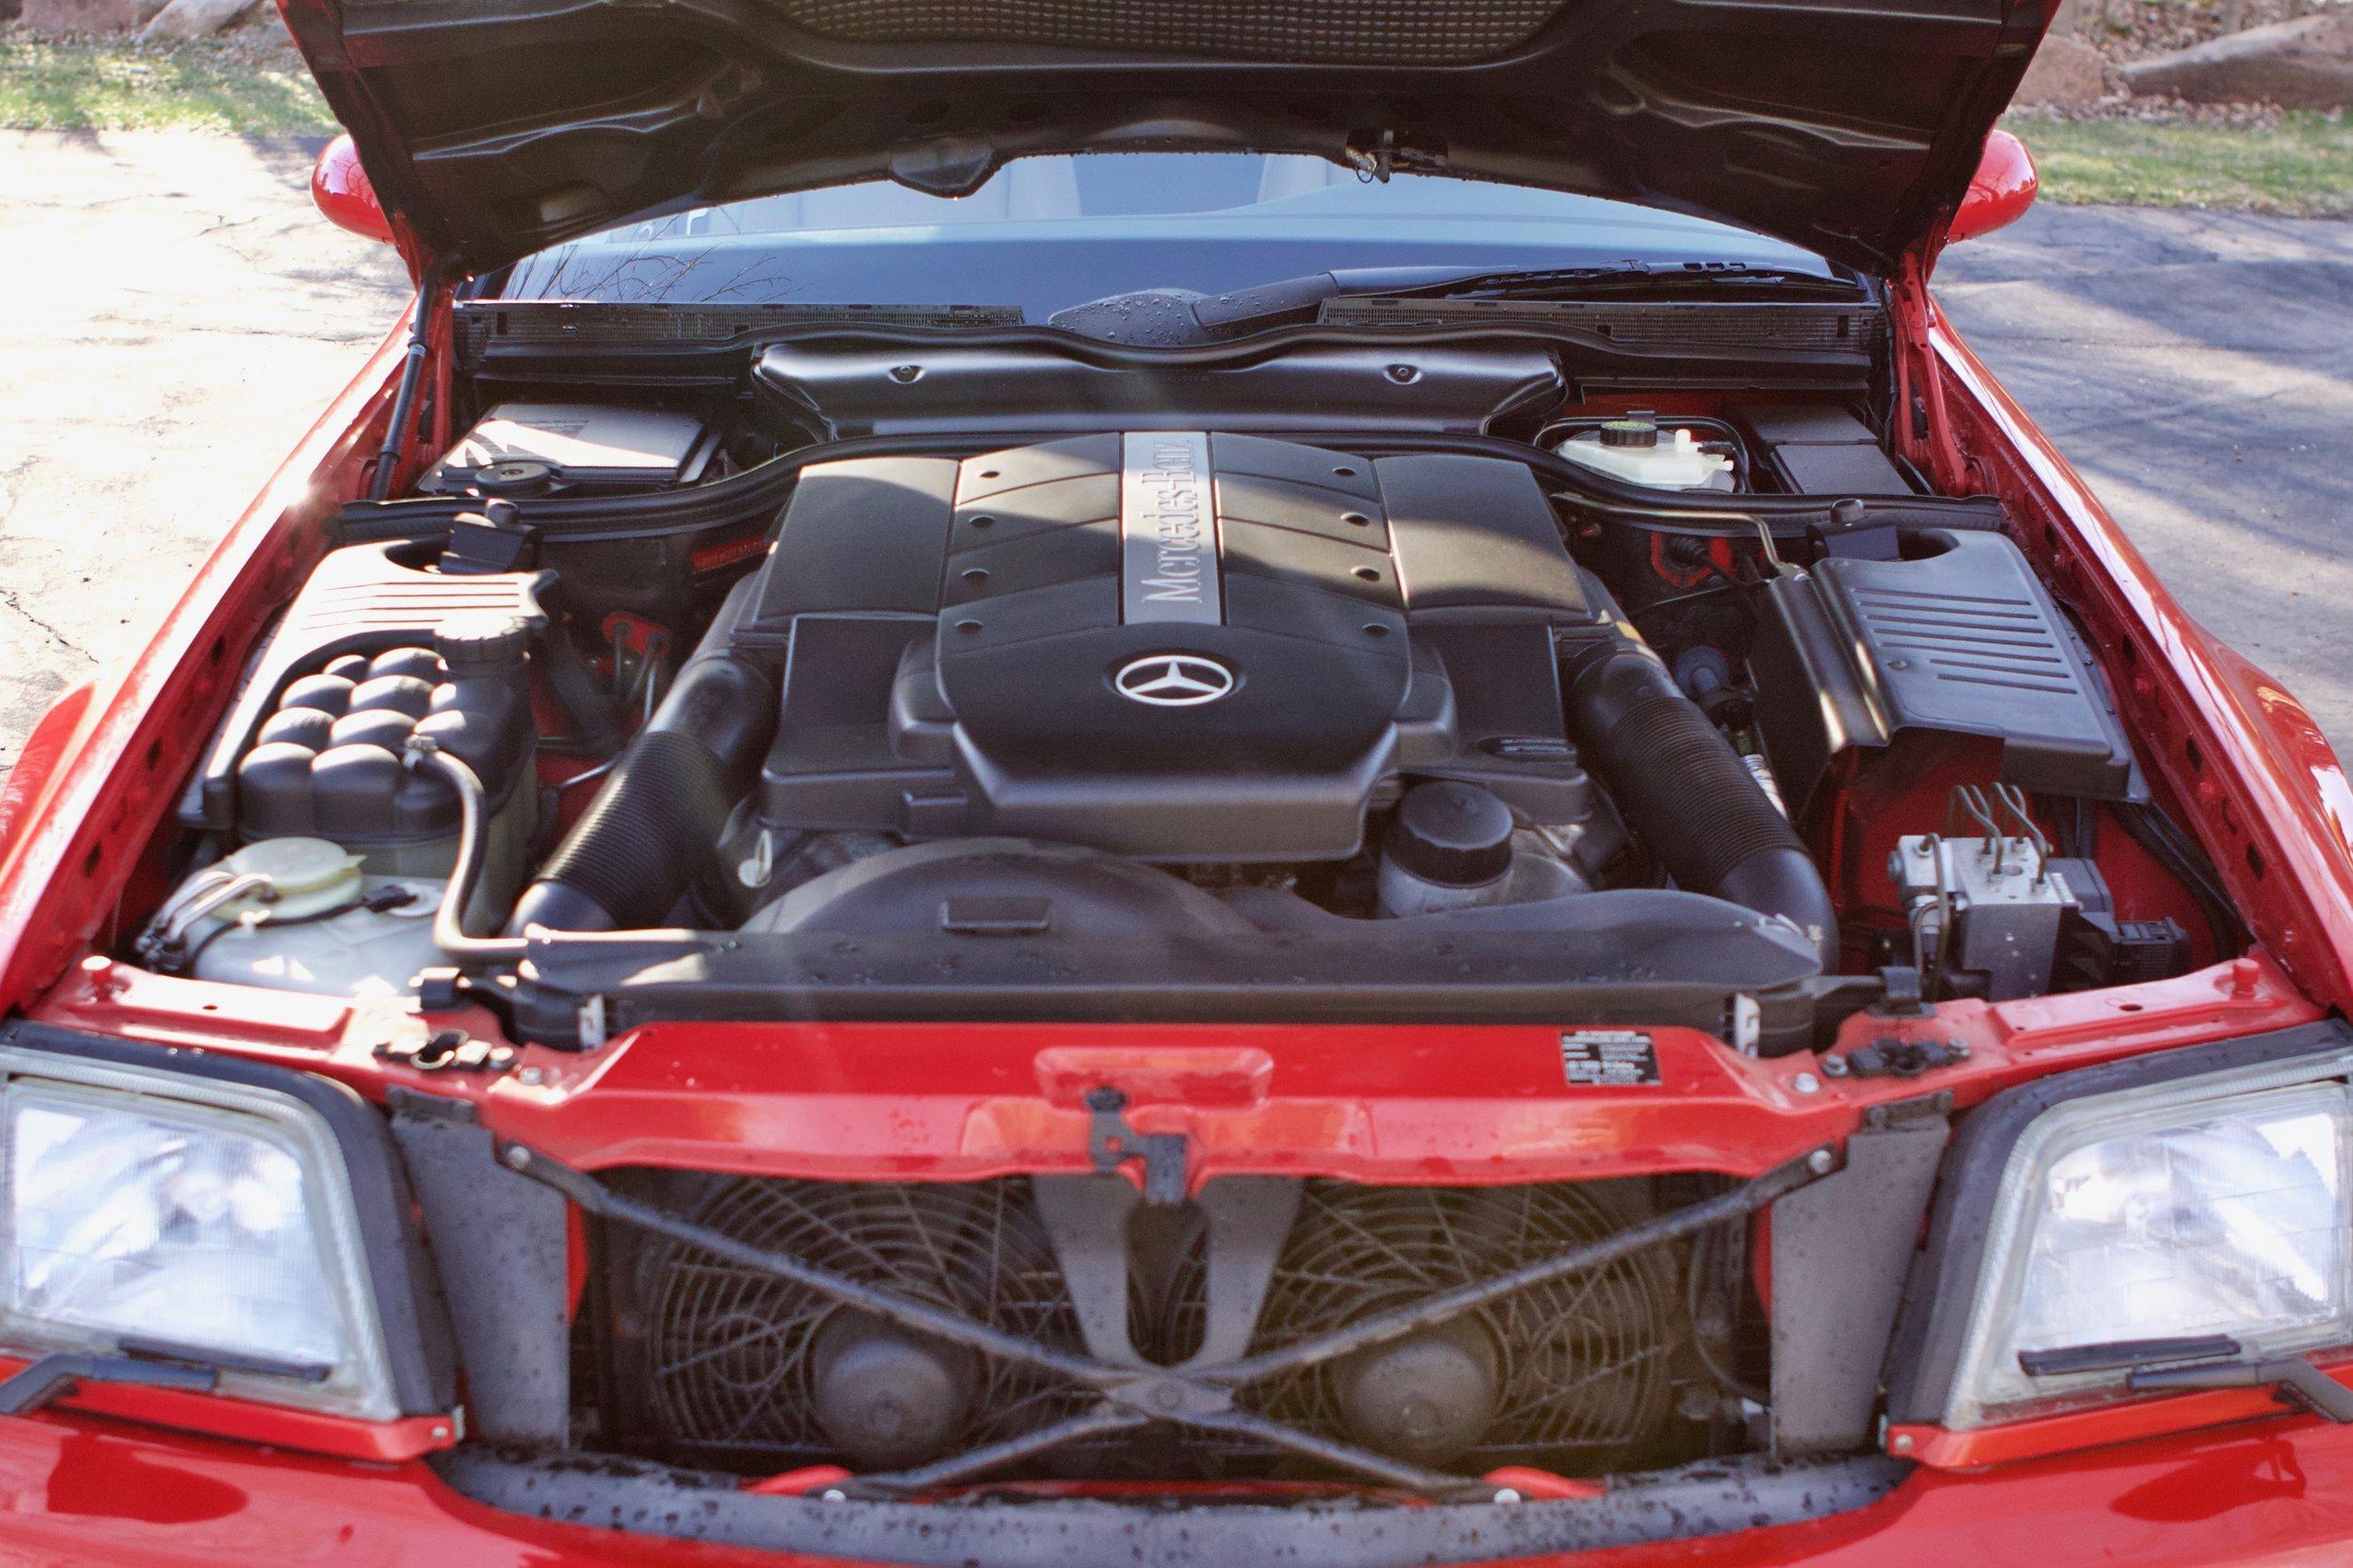 20190504 VIN199084 2001 500SL AMG - 15.jpg